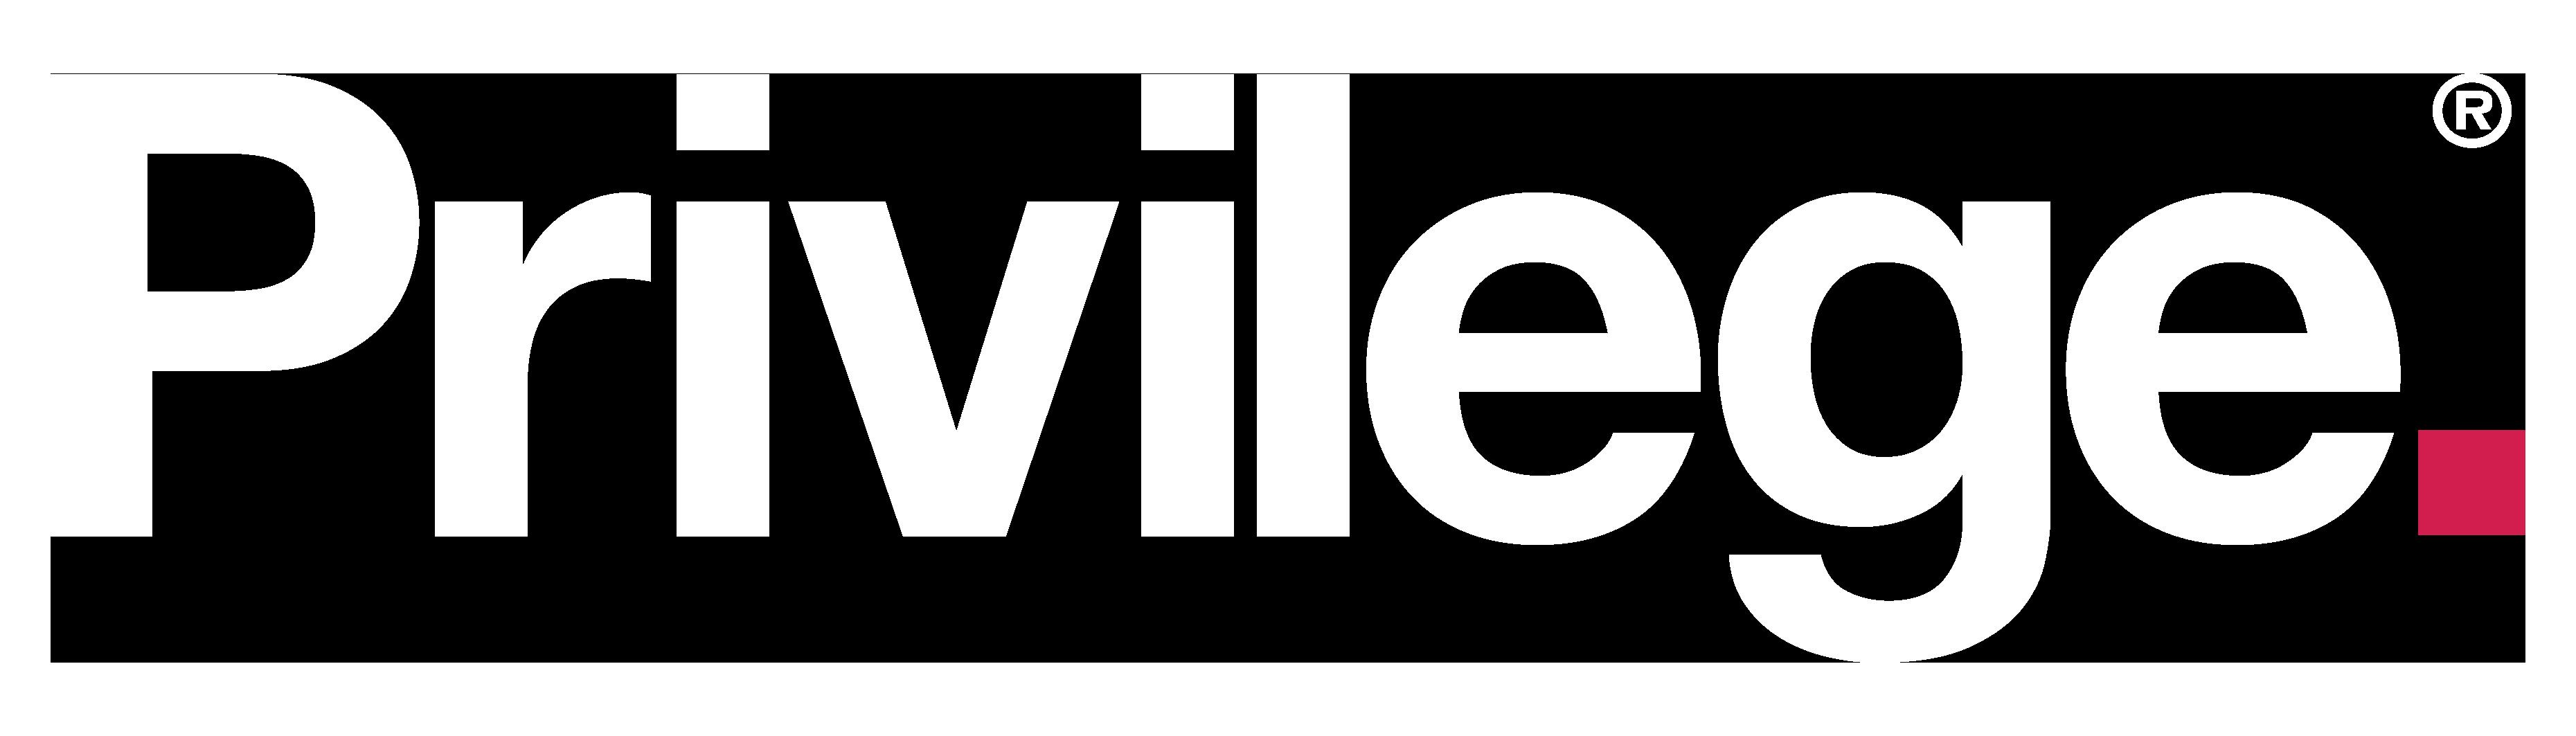 Privilege Car Insurance logo